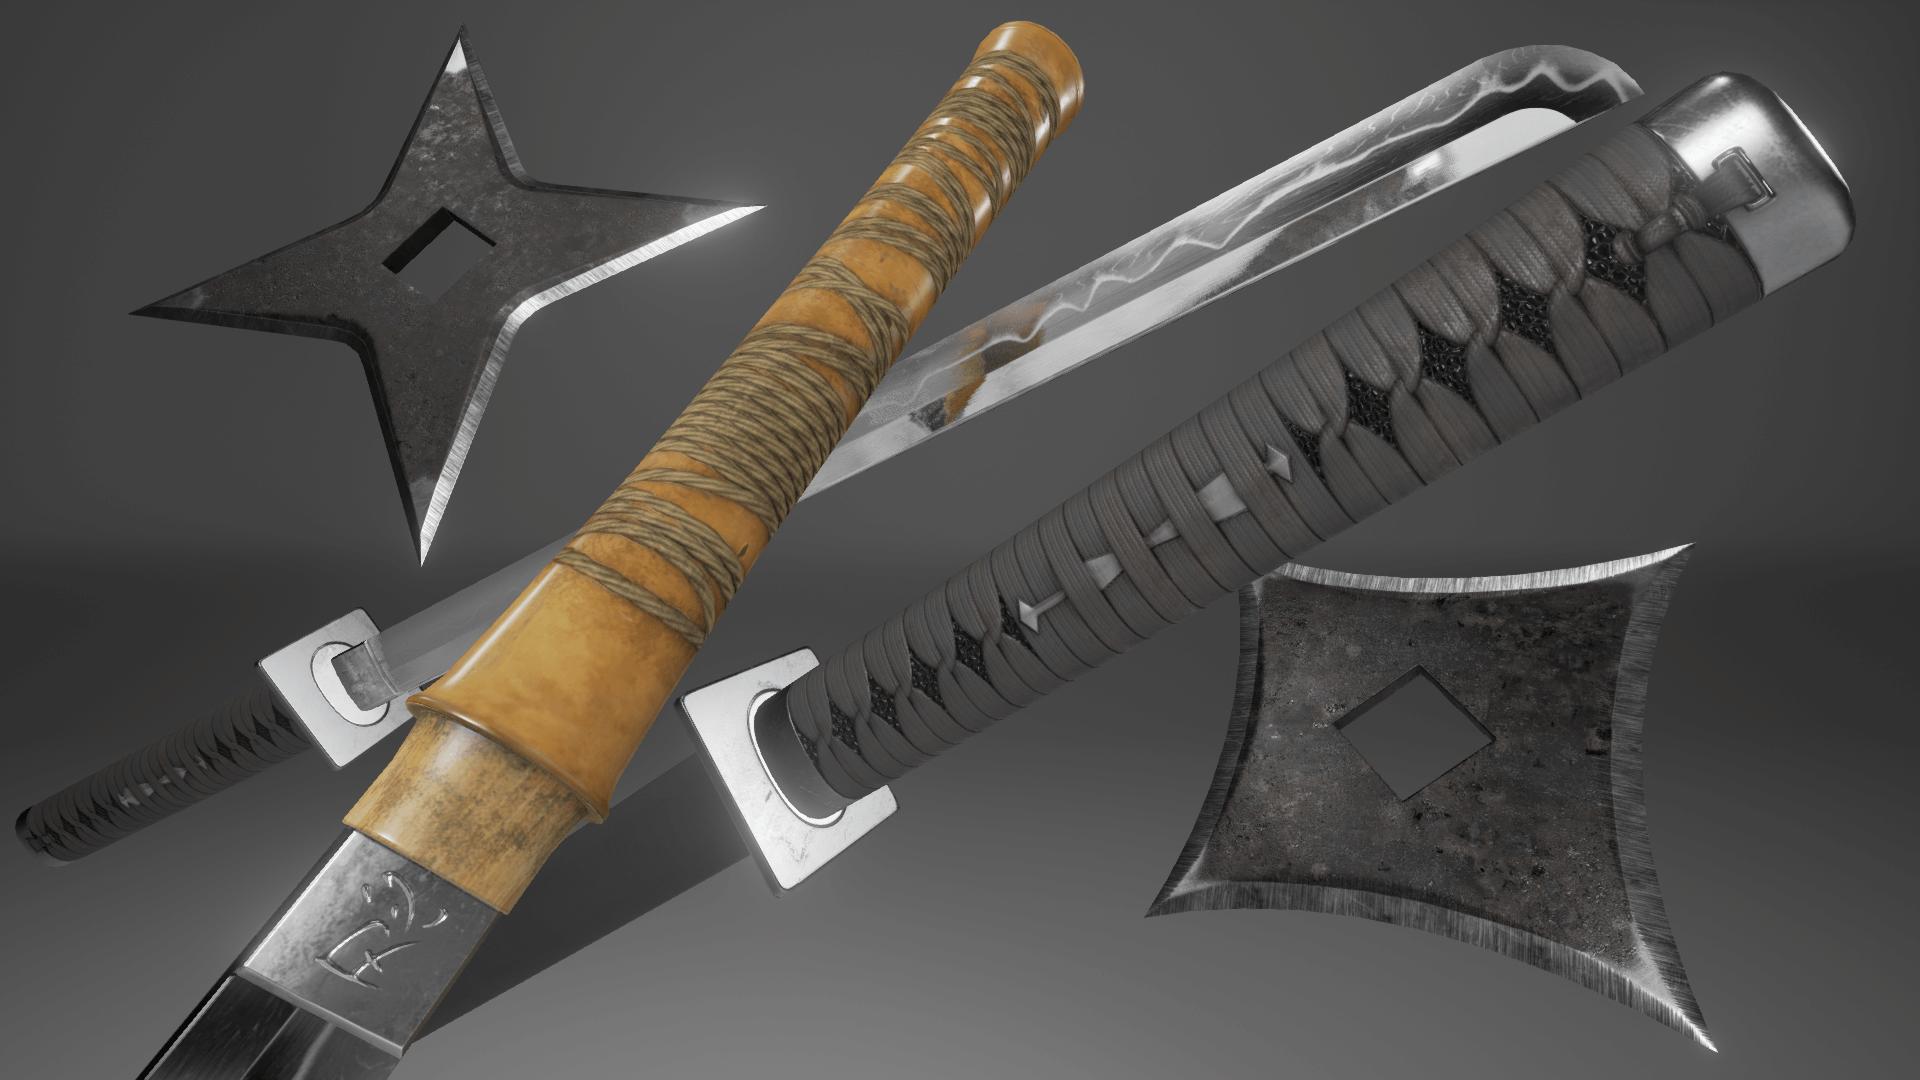 Pin by frank matarrese on Genji | Sword, Ninja weapons ...  |Types Of Ninja Swords